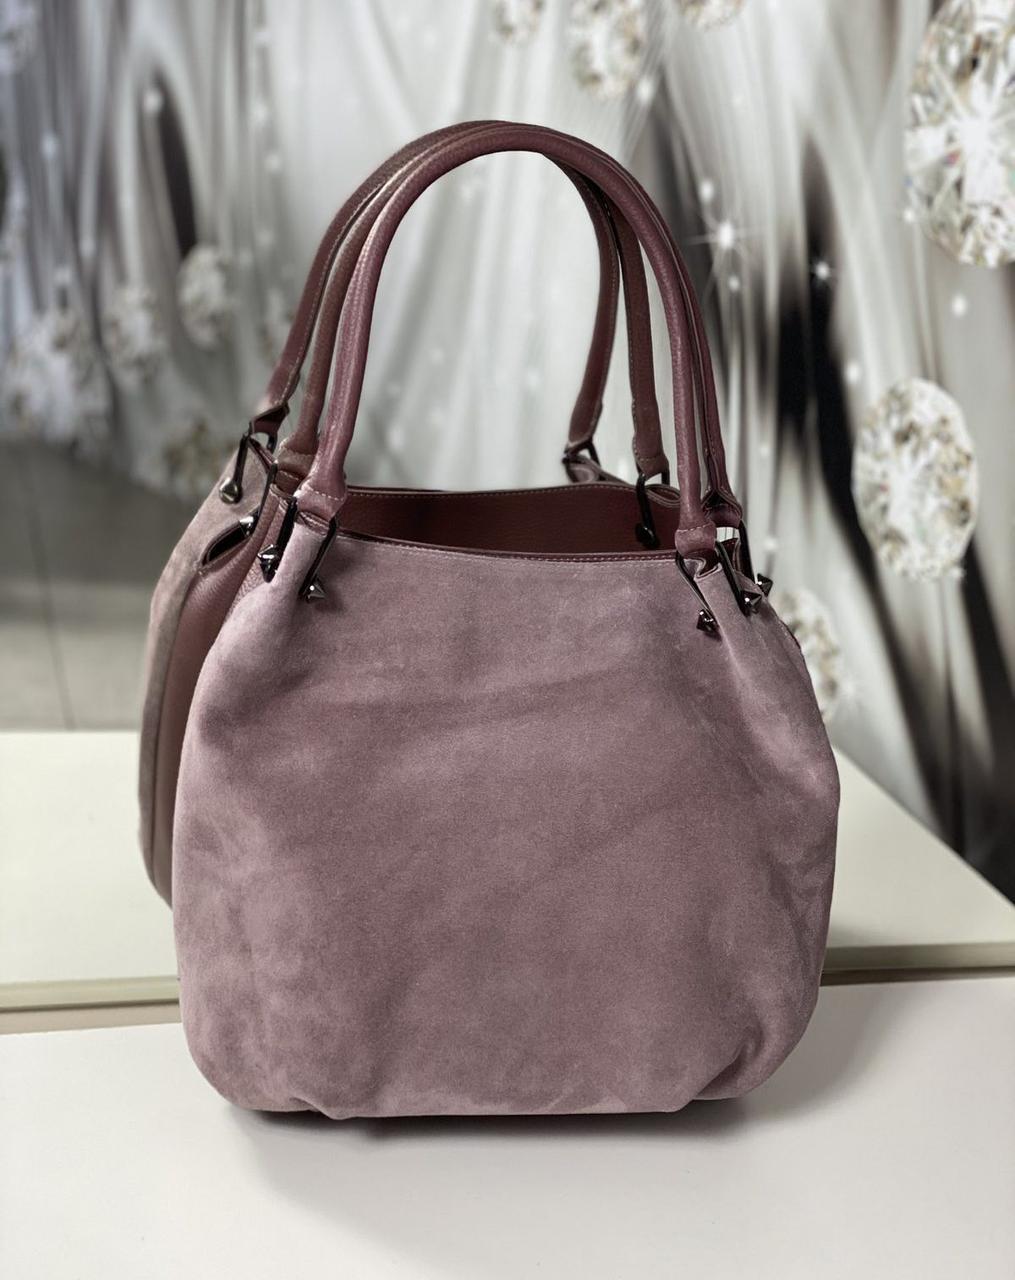 Большая замшевая женская сумка-мешок на плечо стильная молодежная темная пудра натуральная замша+кожзам